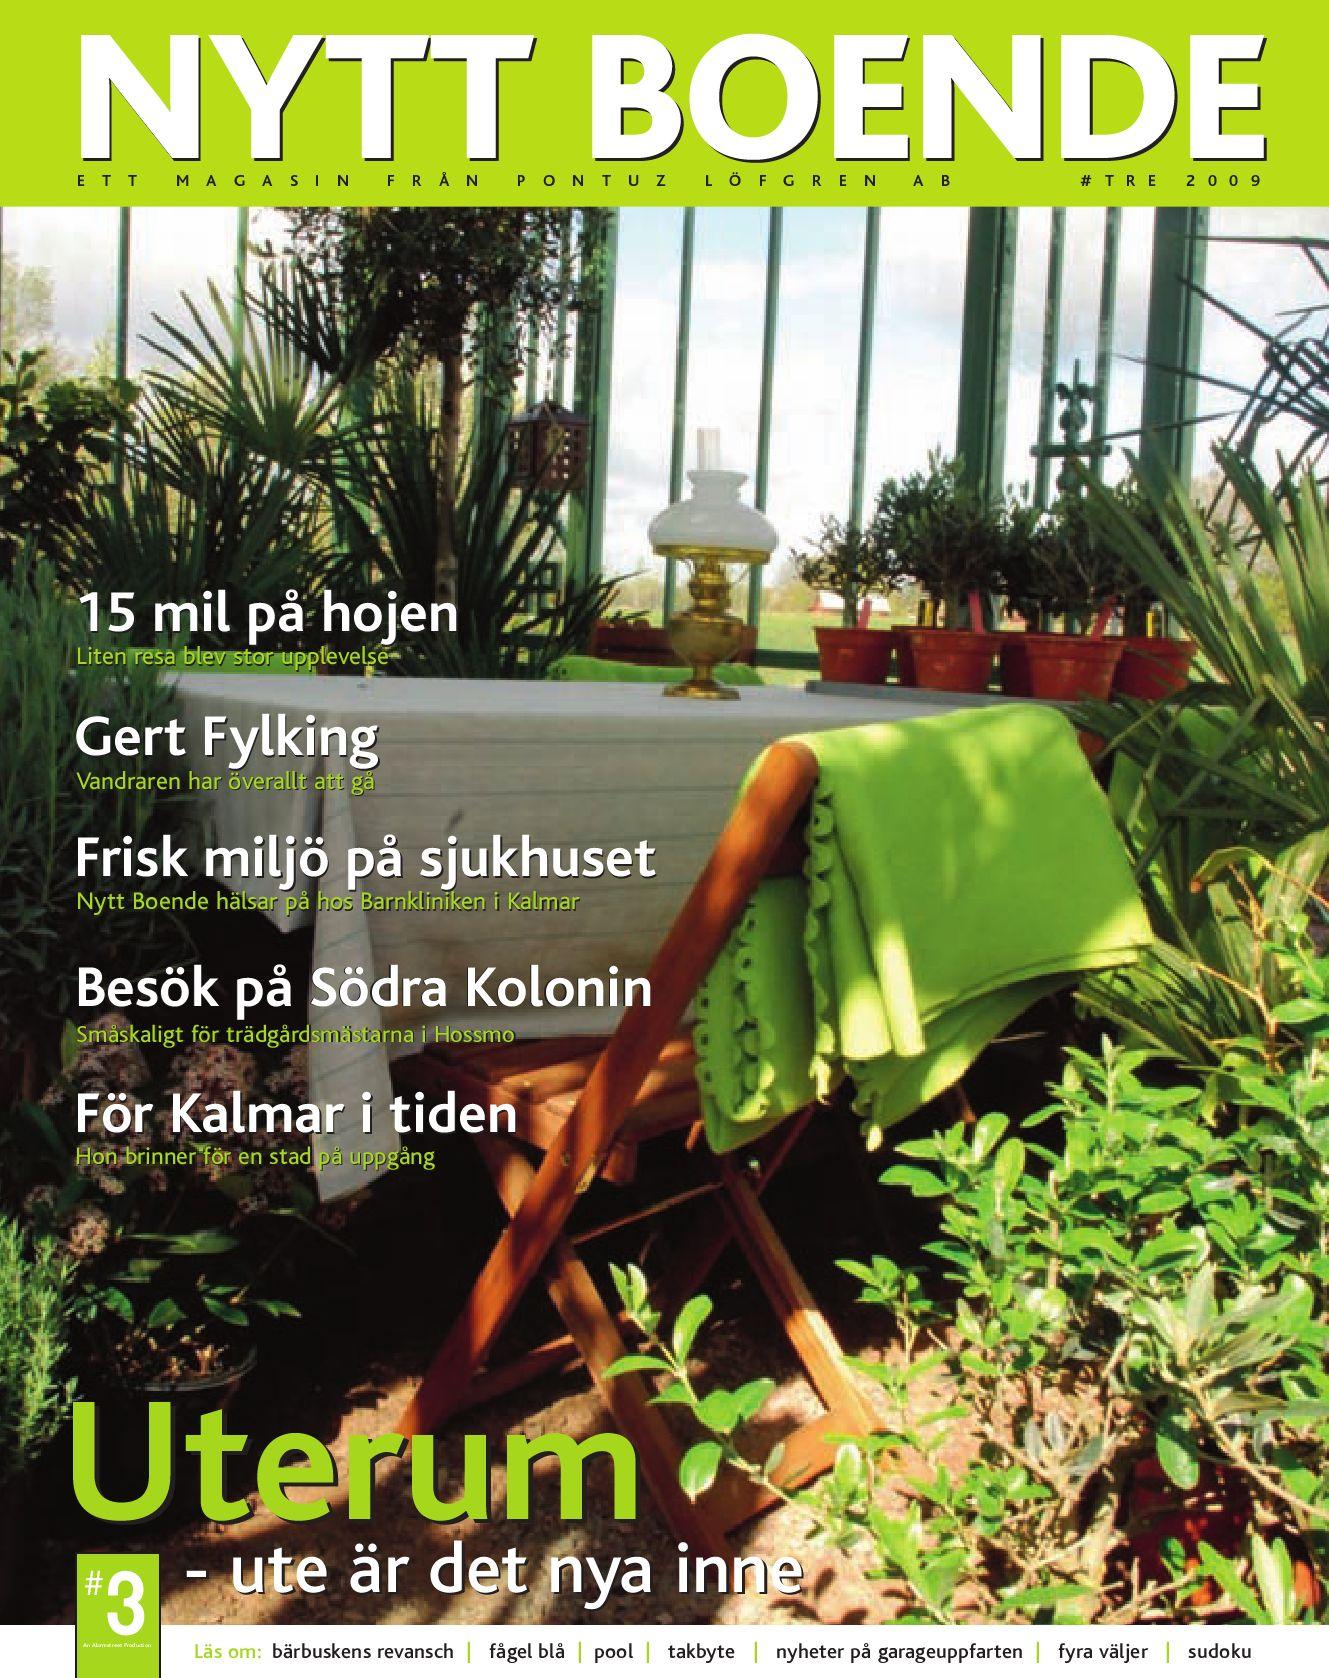 Nytt boende nr 1, 2015 by pontuz löfgren ab   issuu